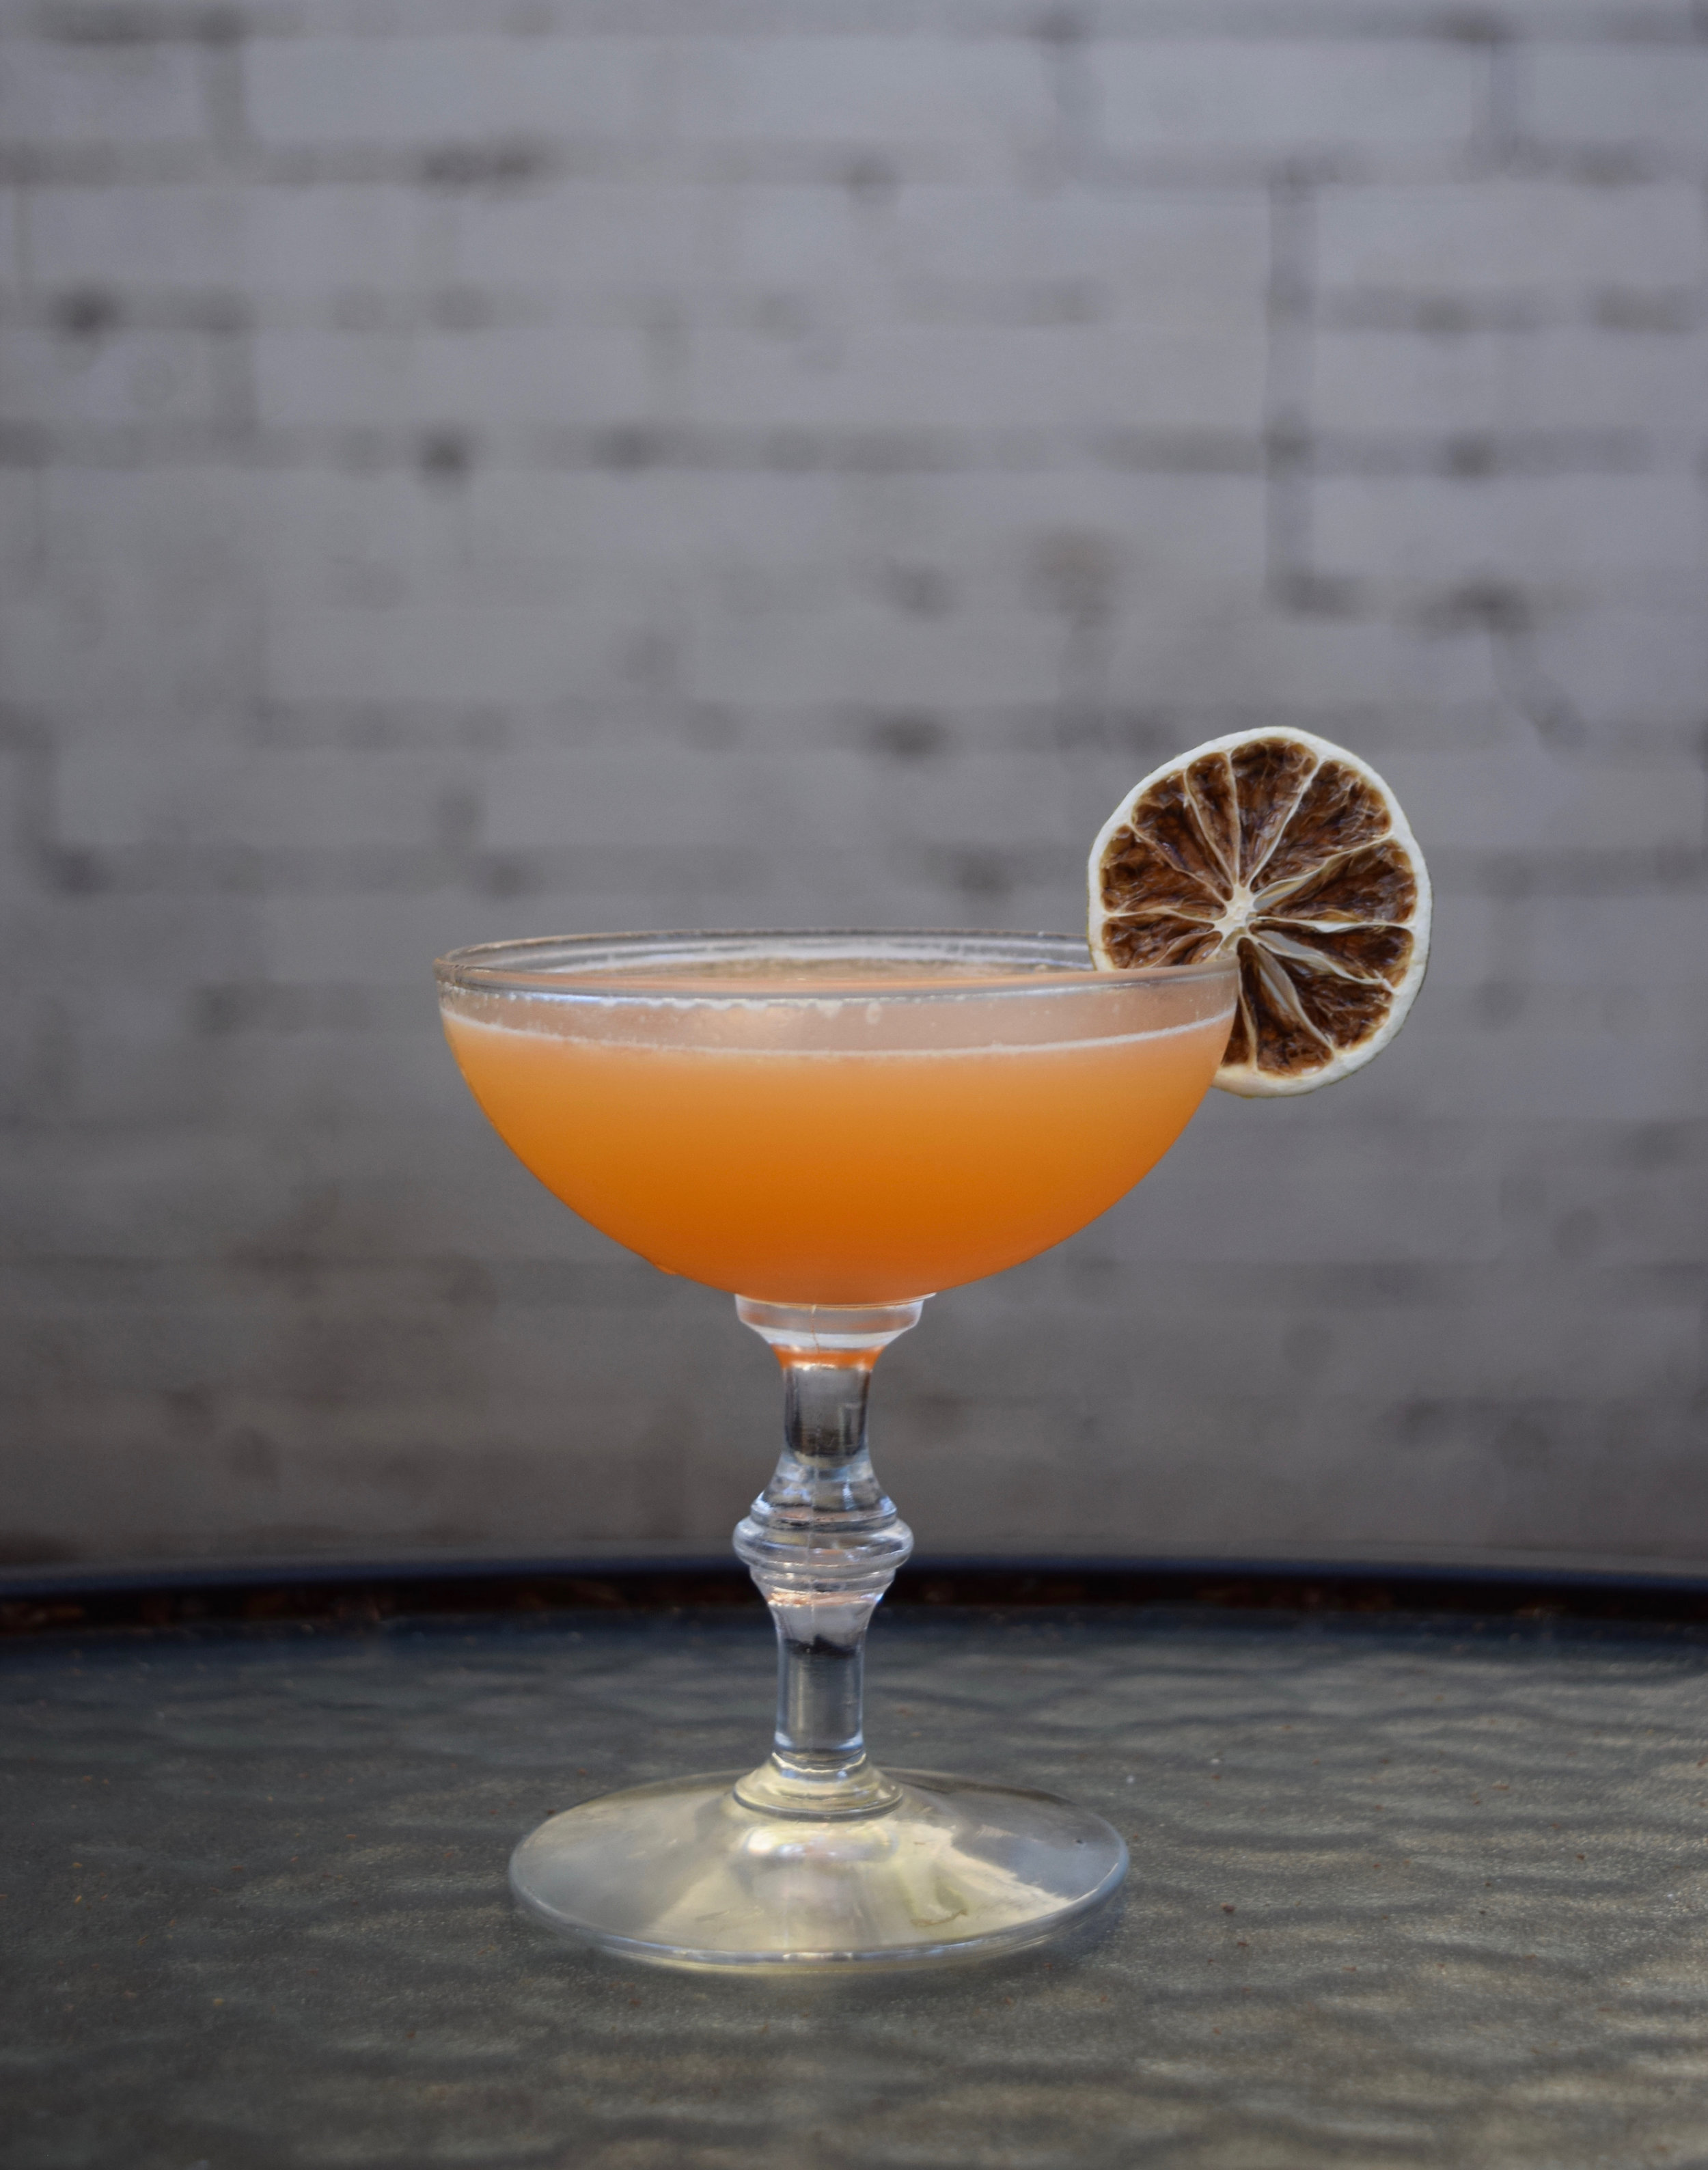 RETROGRADE - 1.5 oz blanco tequila1/2 oz aperol1/2 oz nostrum pineapple turmeric ginger shrub3/4 oz fresh lime juiceShake with ice and strain.